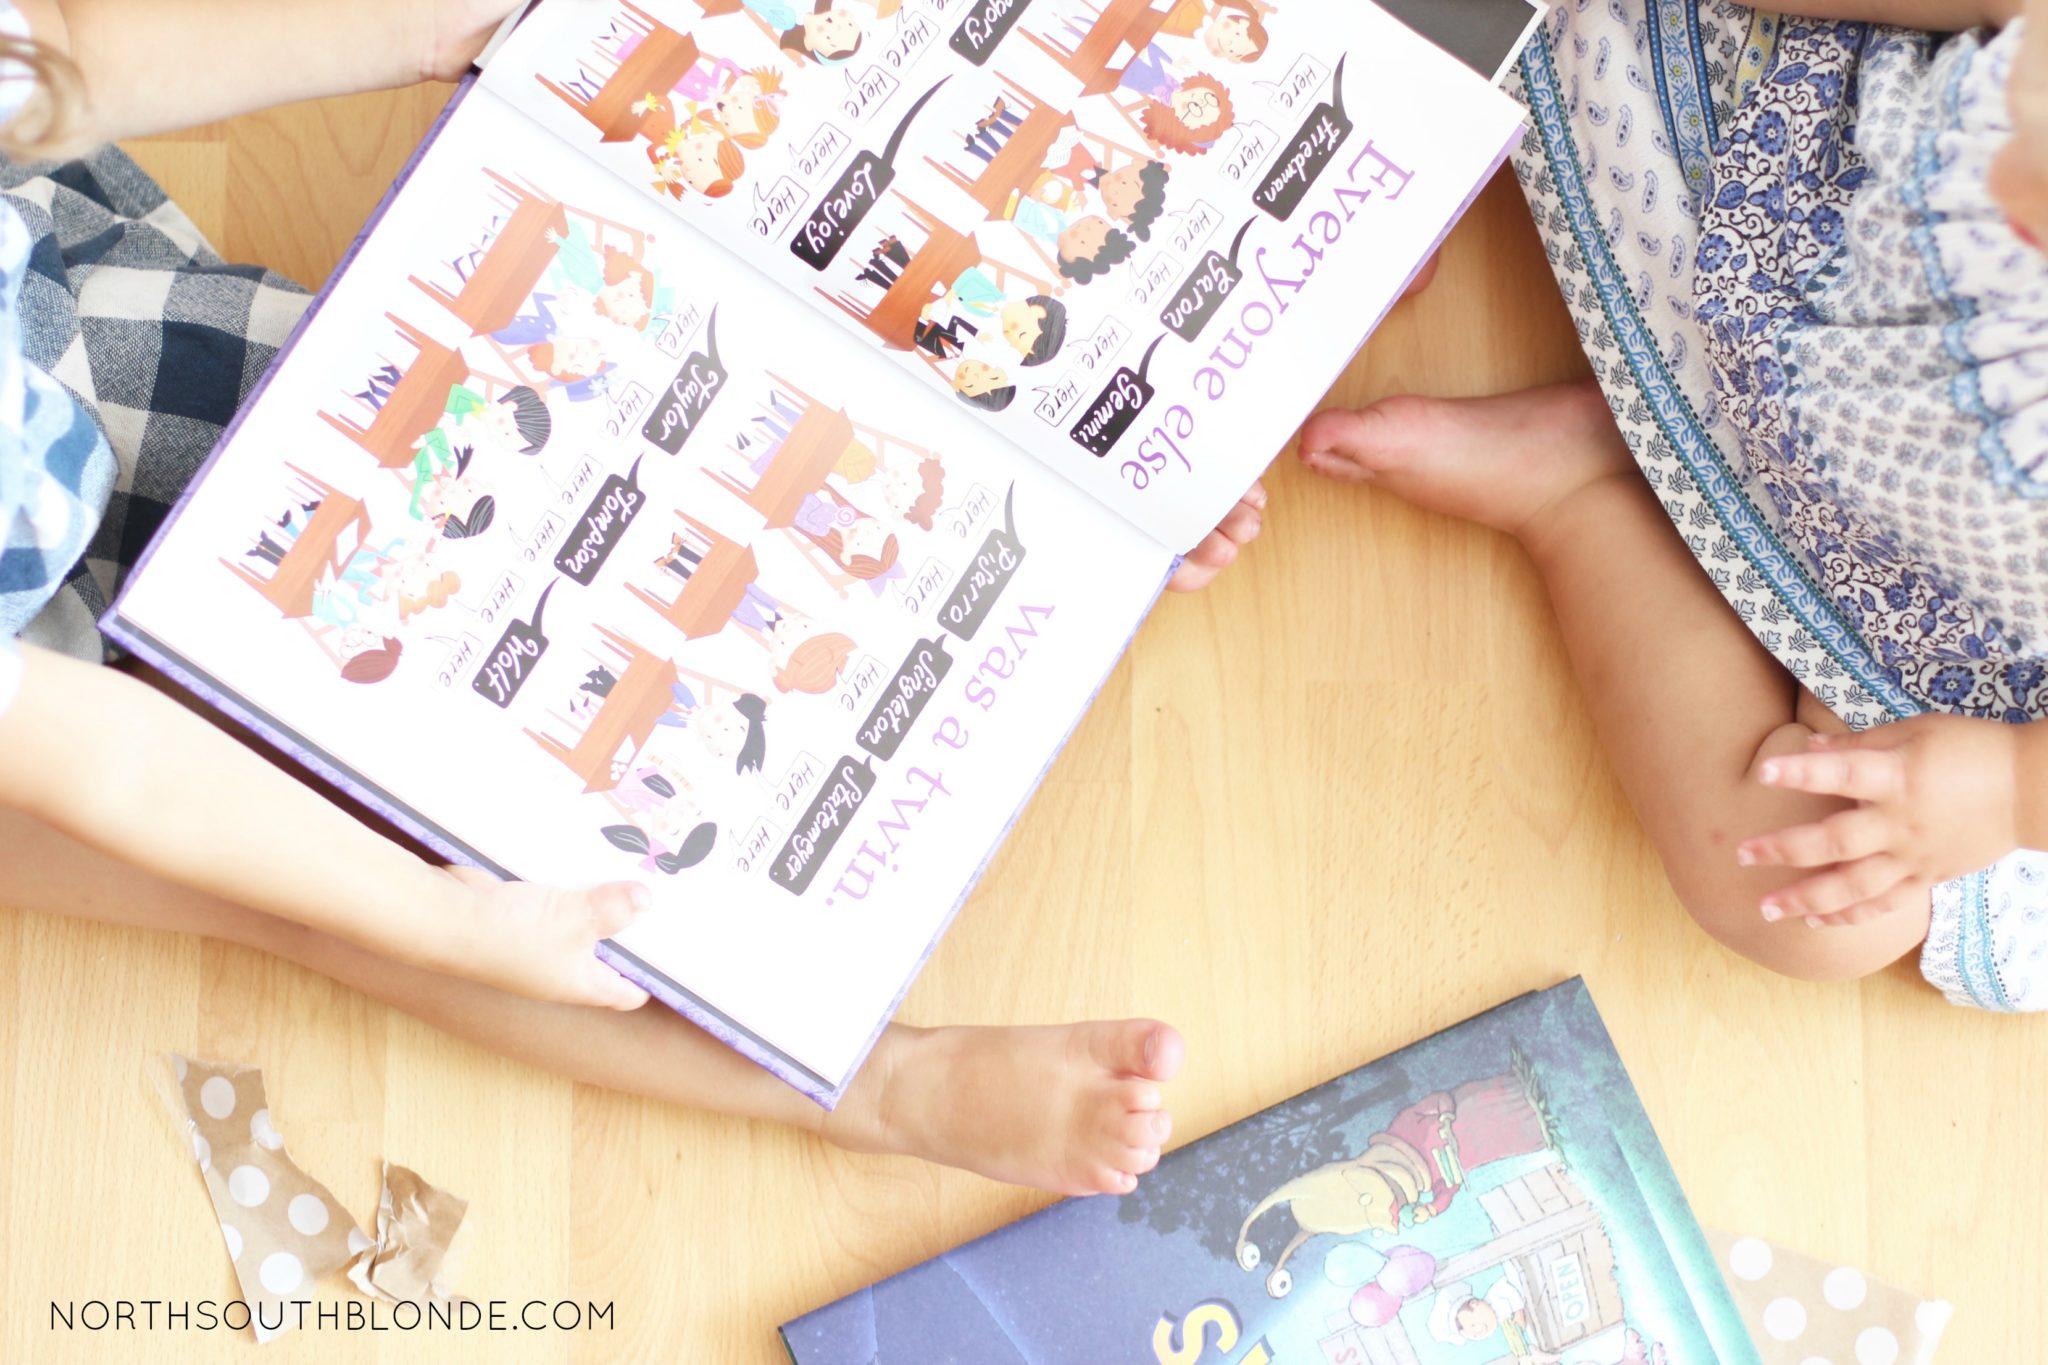 bookroo children's book subscription